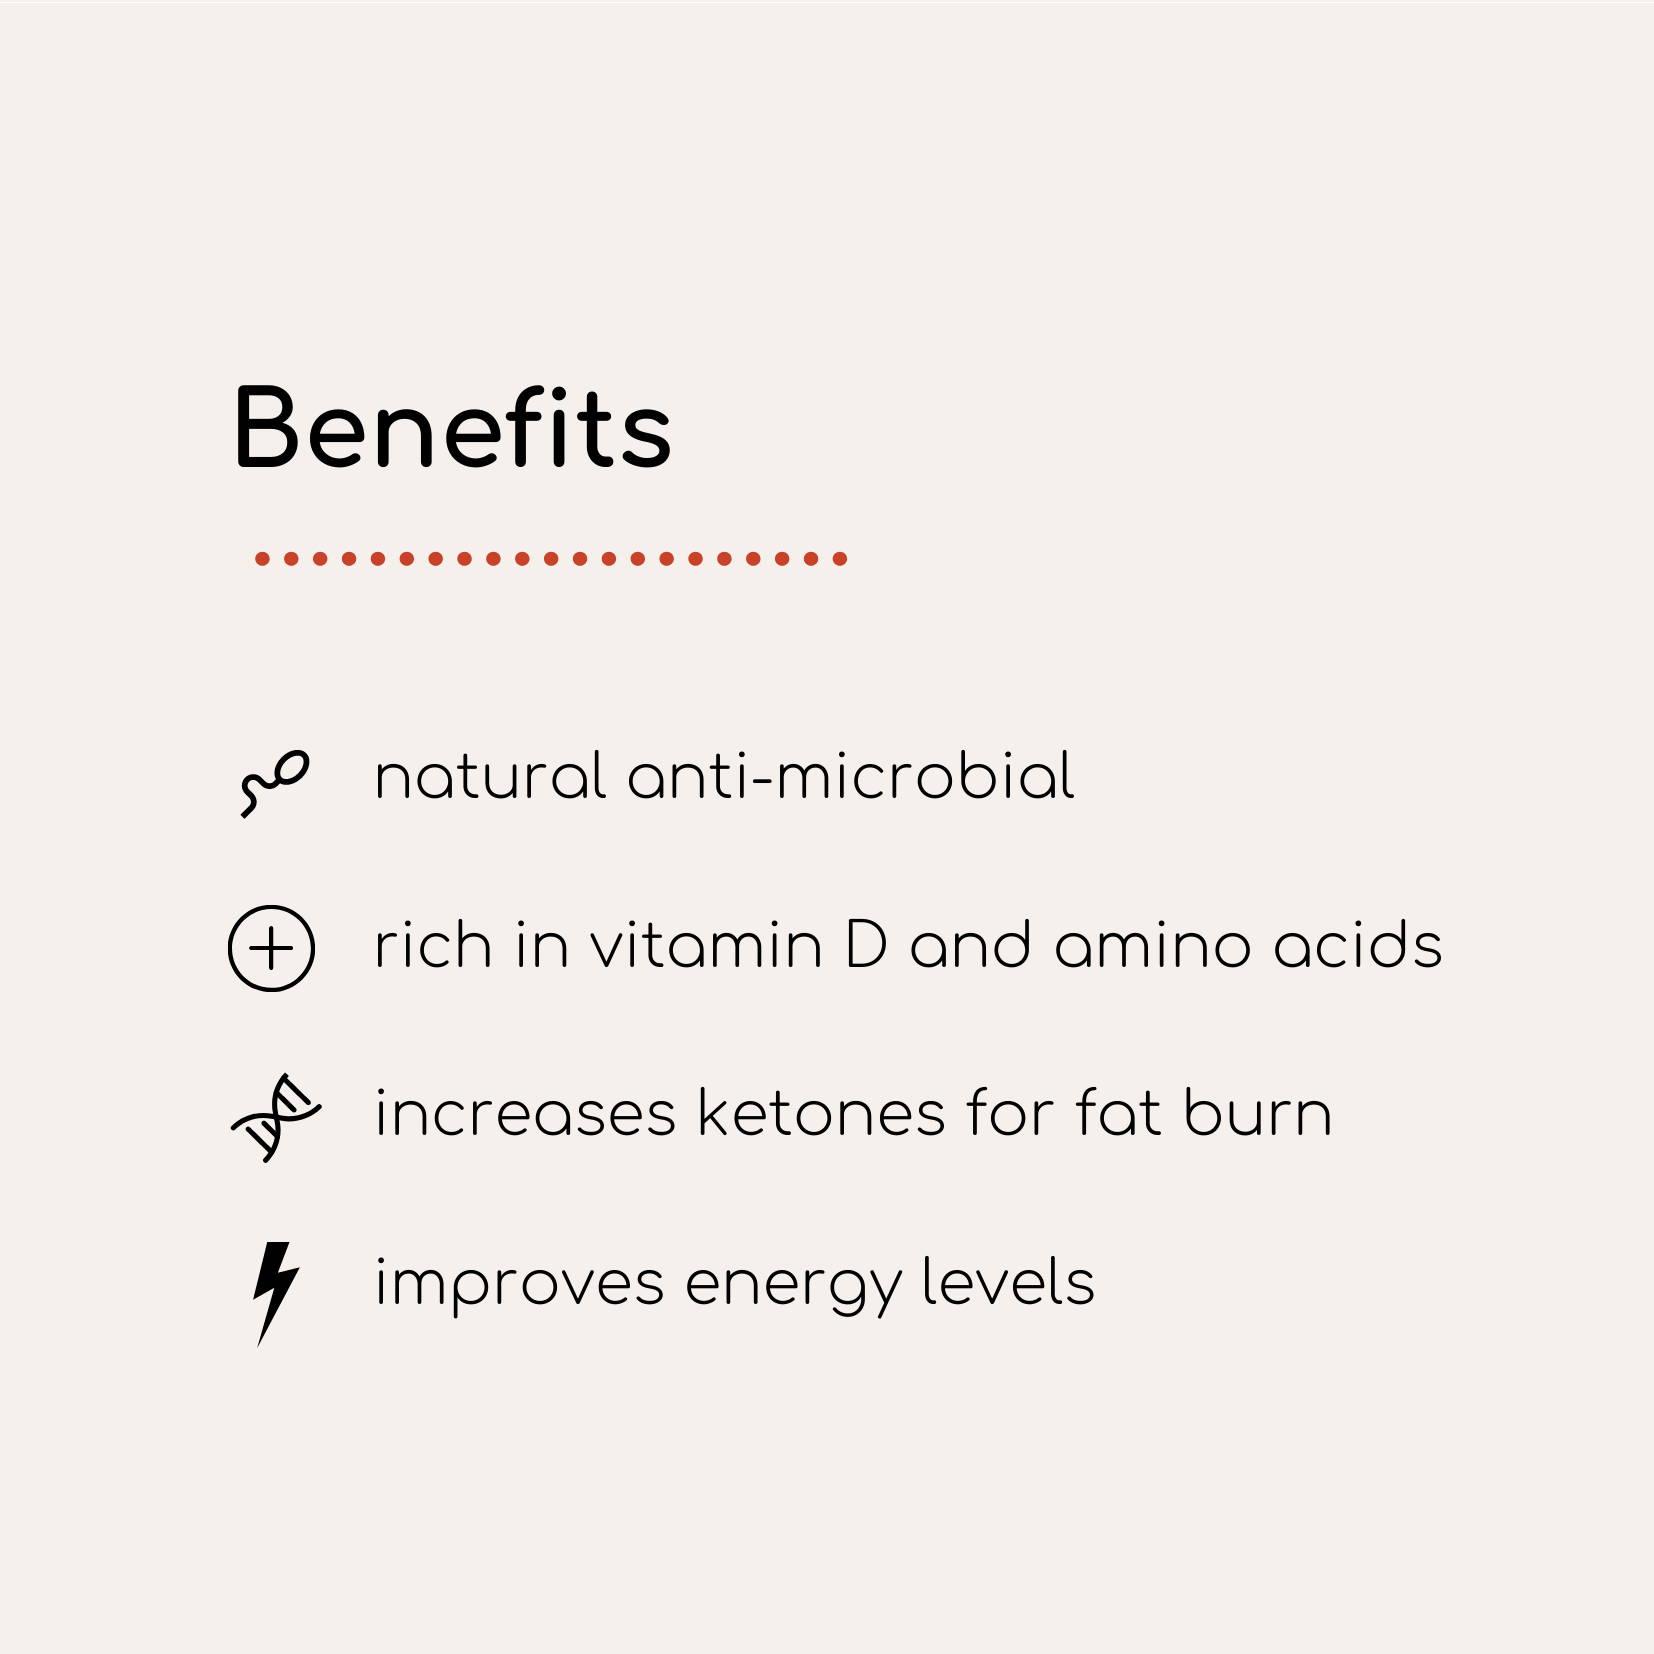 infographic list of benefits